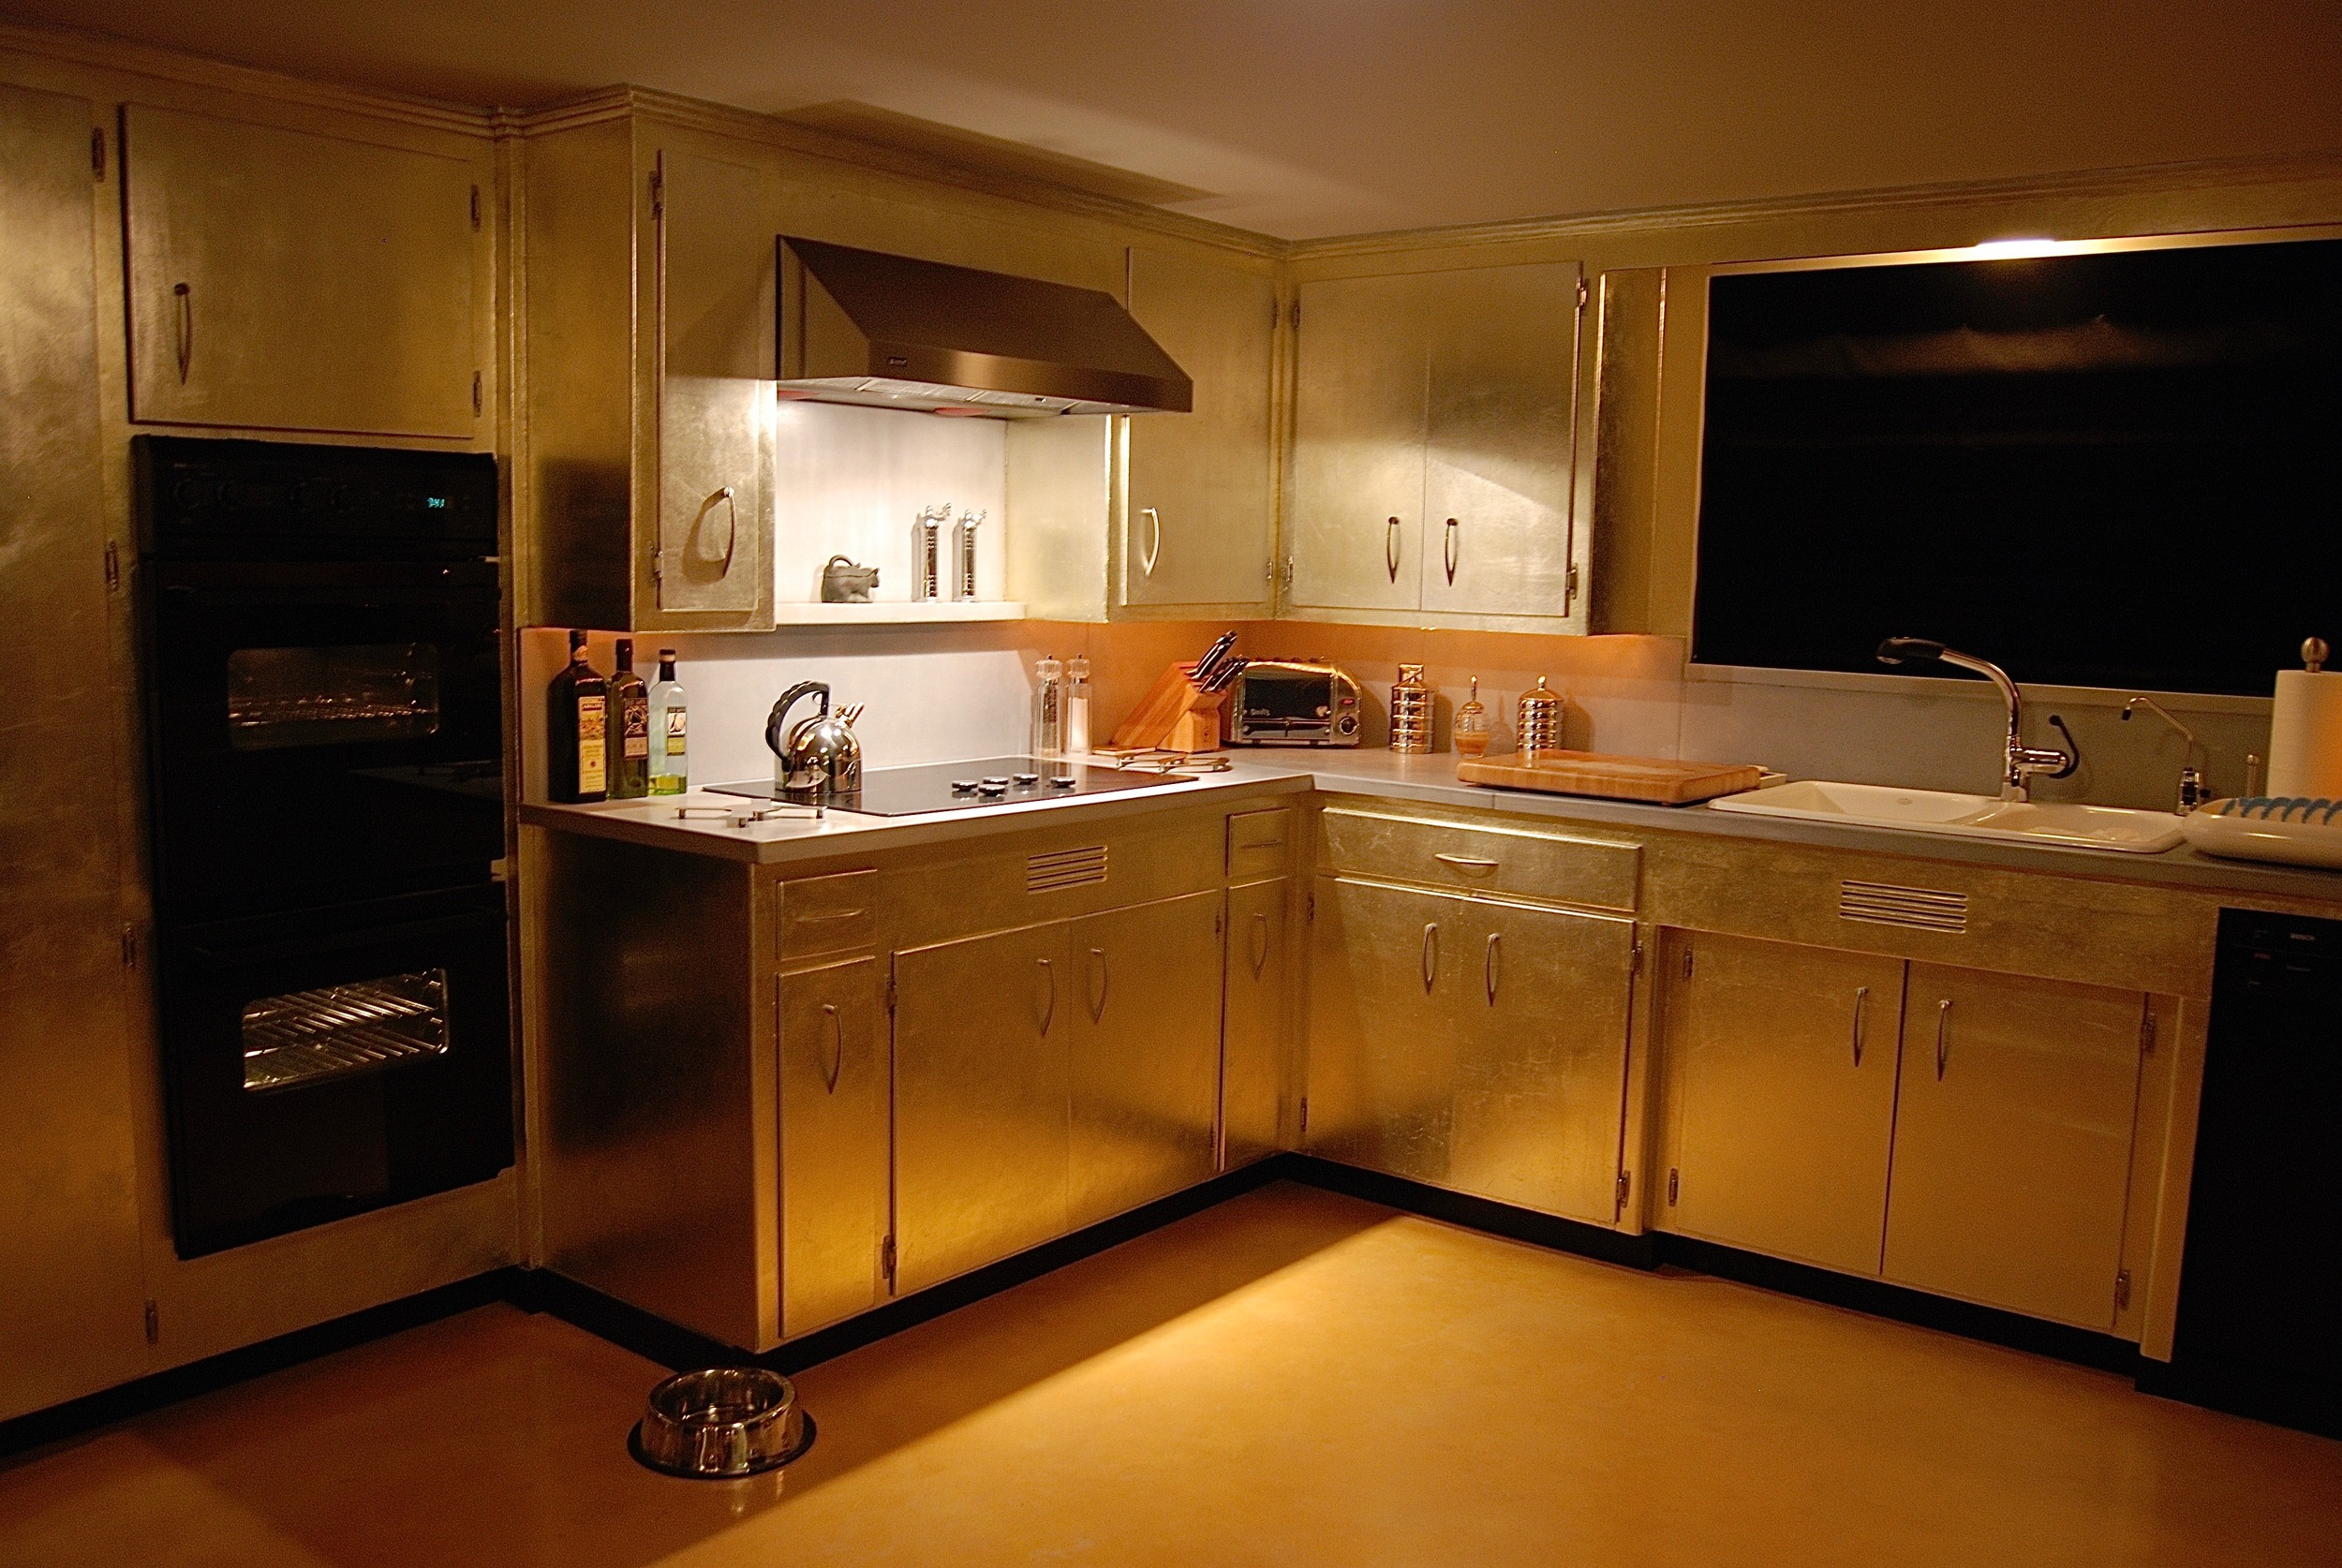 Coffin & King Custom Furniture/ Interiors - Aluminum Leafed Original '50s Kitchen Cabinets, Cast Concrete Countertops, Cast Concrete Backsplash